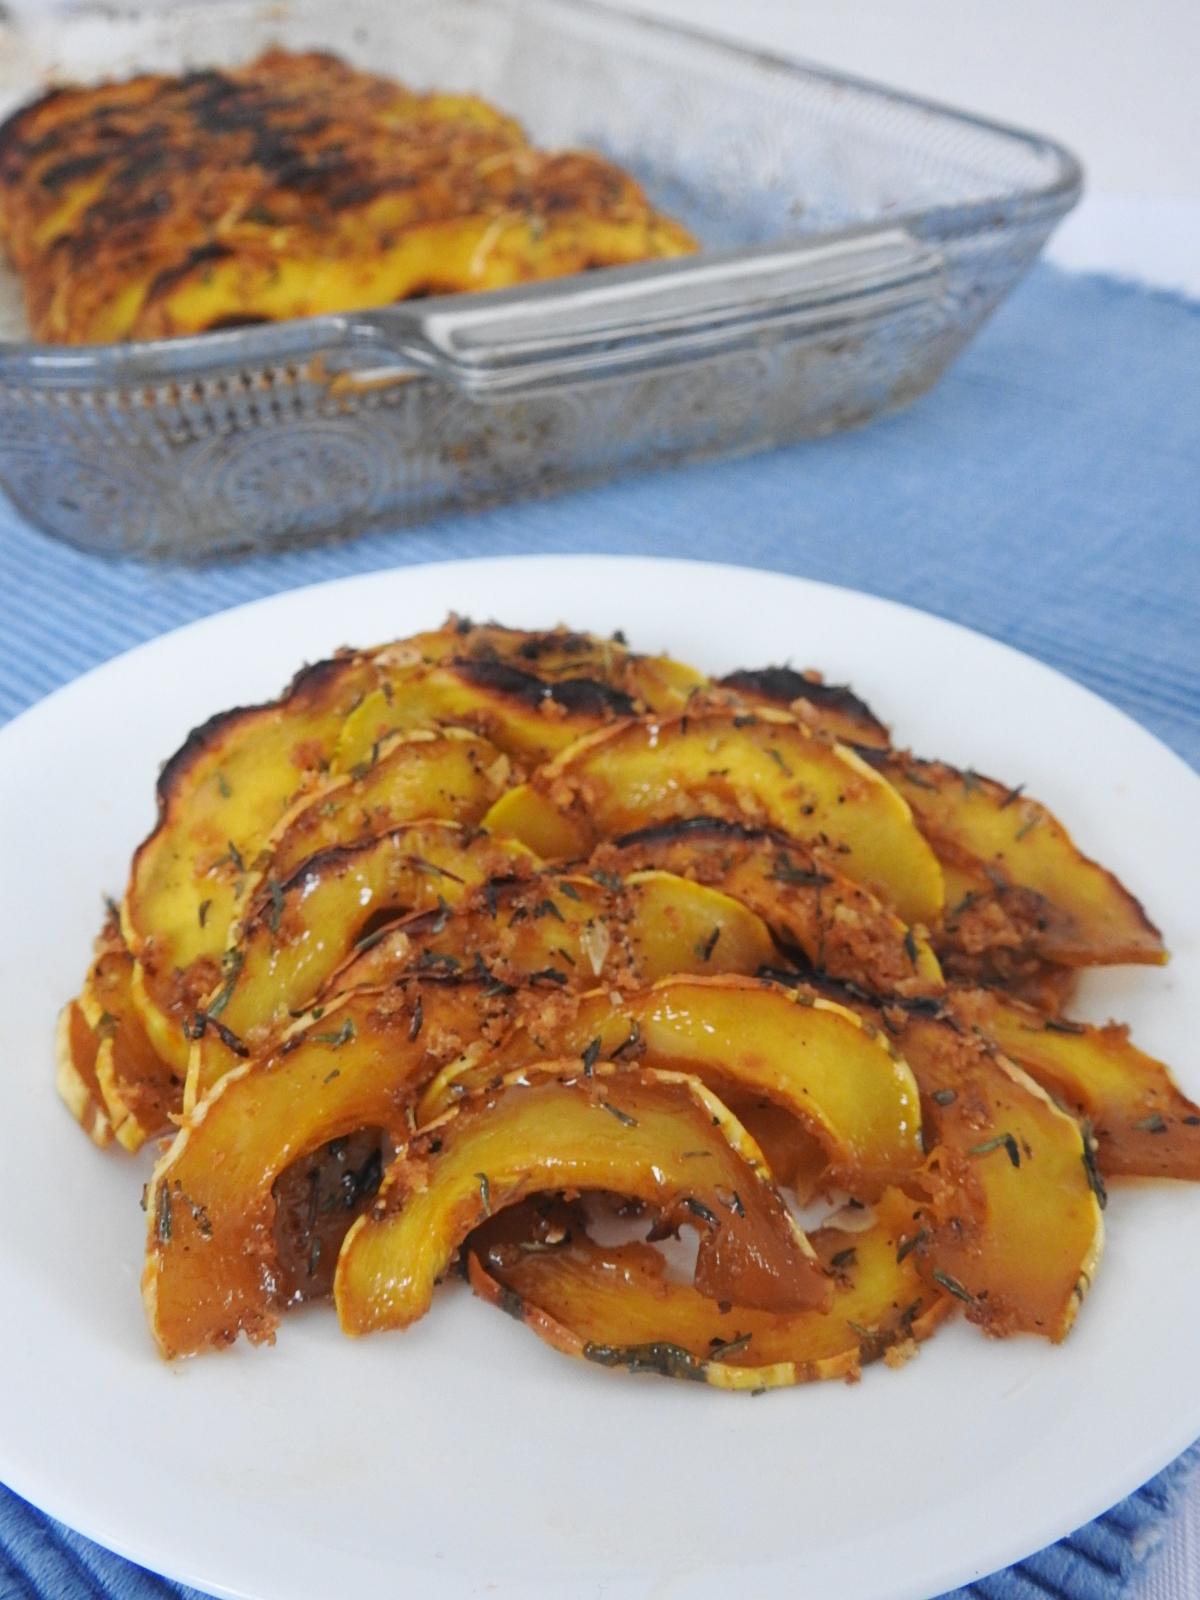 Crunchy Maple Glazed Squash